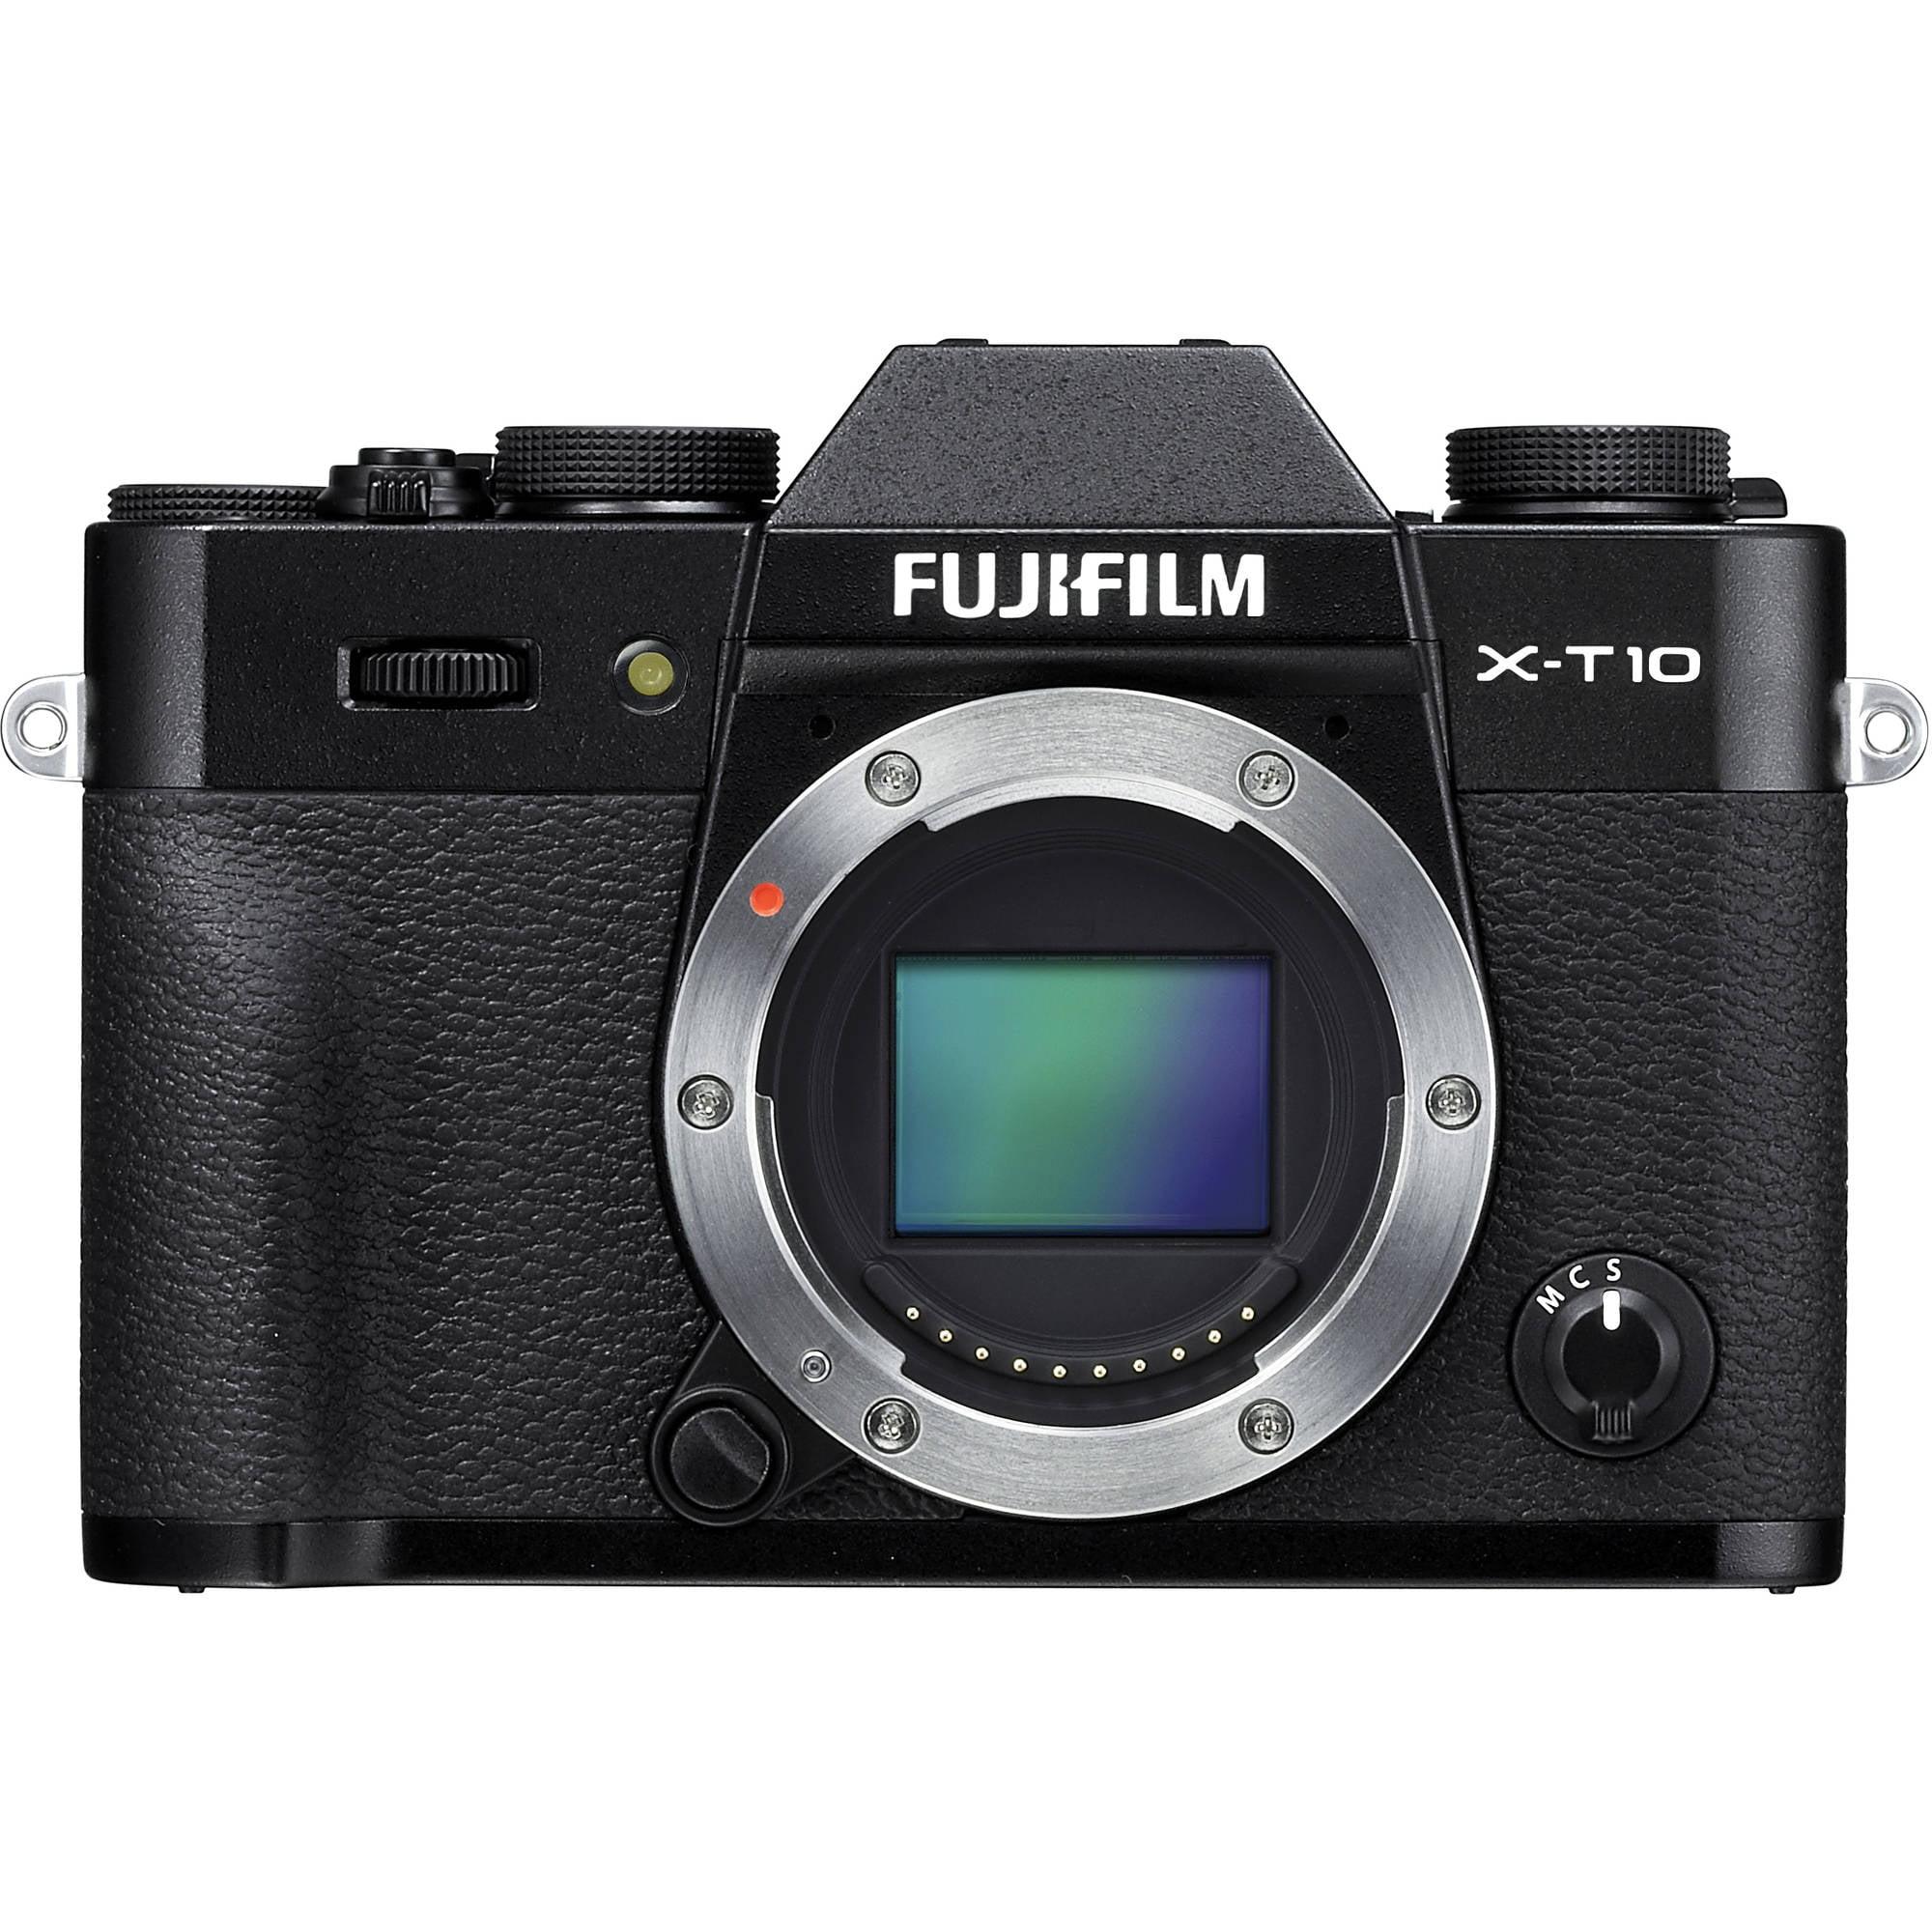 FujiFilm X-T10 Mirrorless Digital Camera with 16-50mm F3.5-5.6 OIS II Lens by Fujifilm